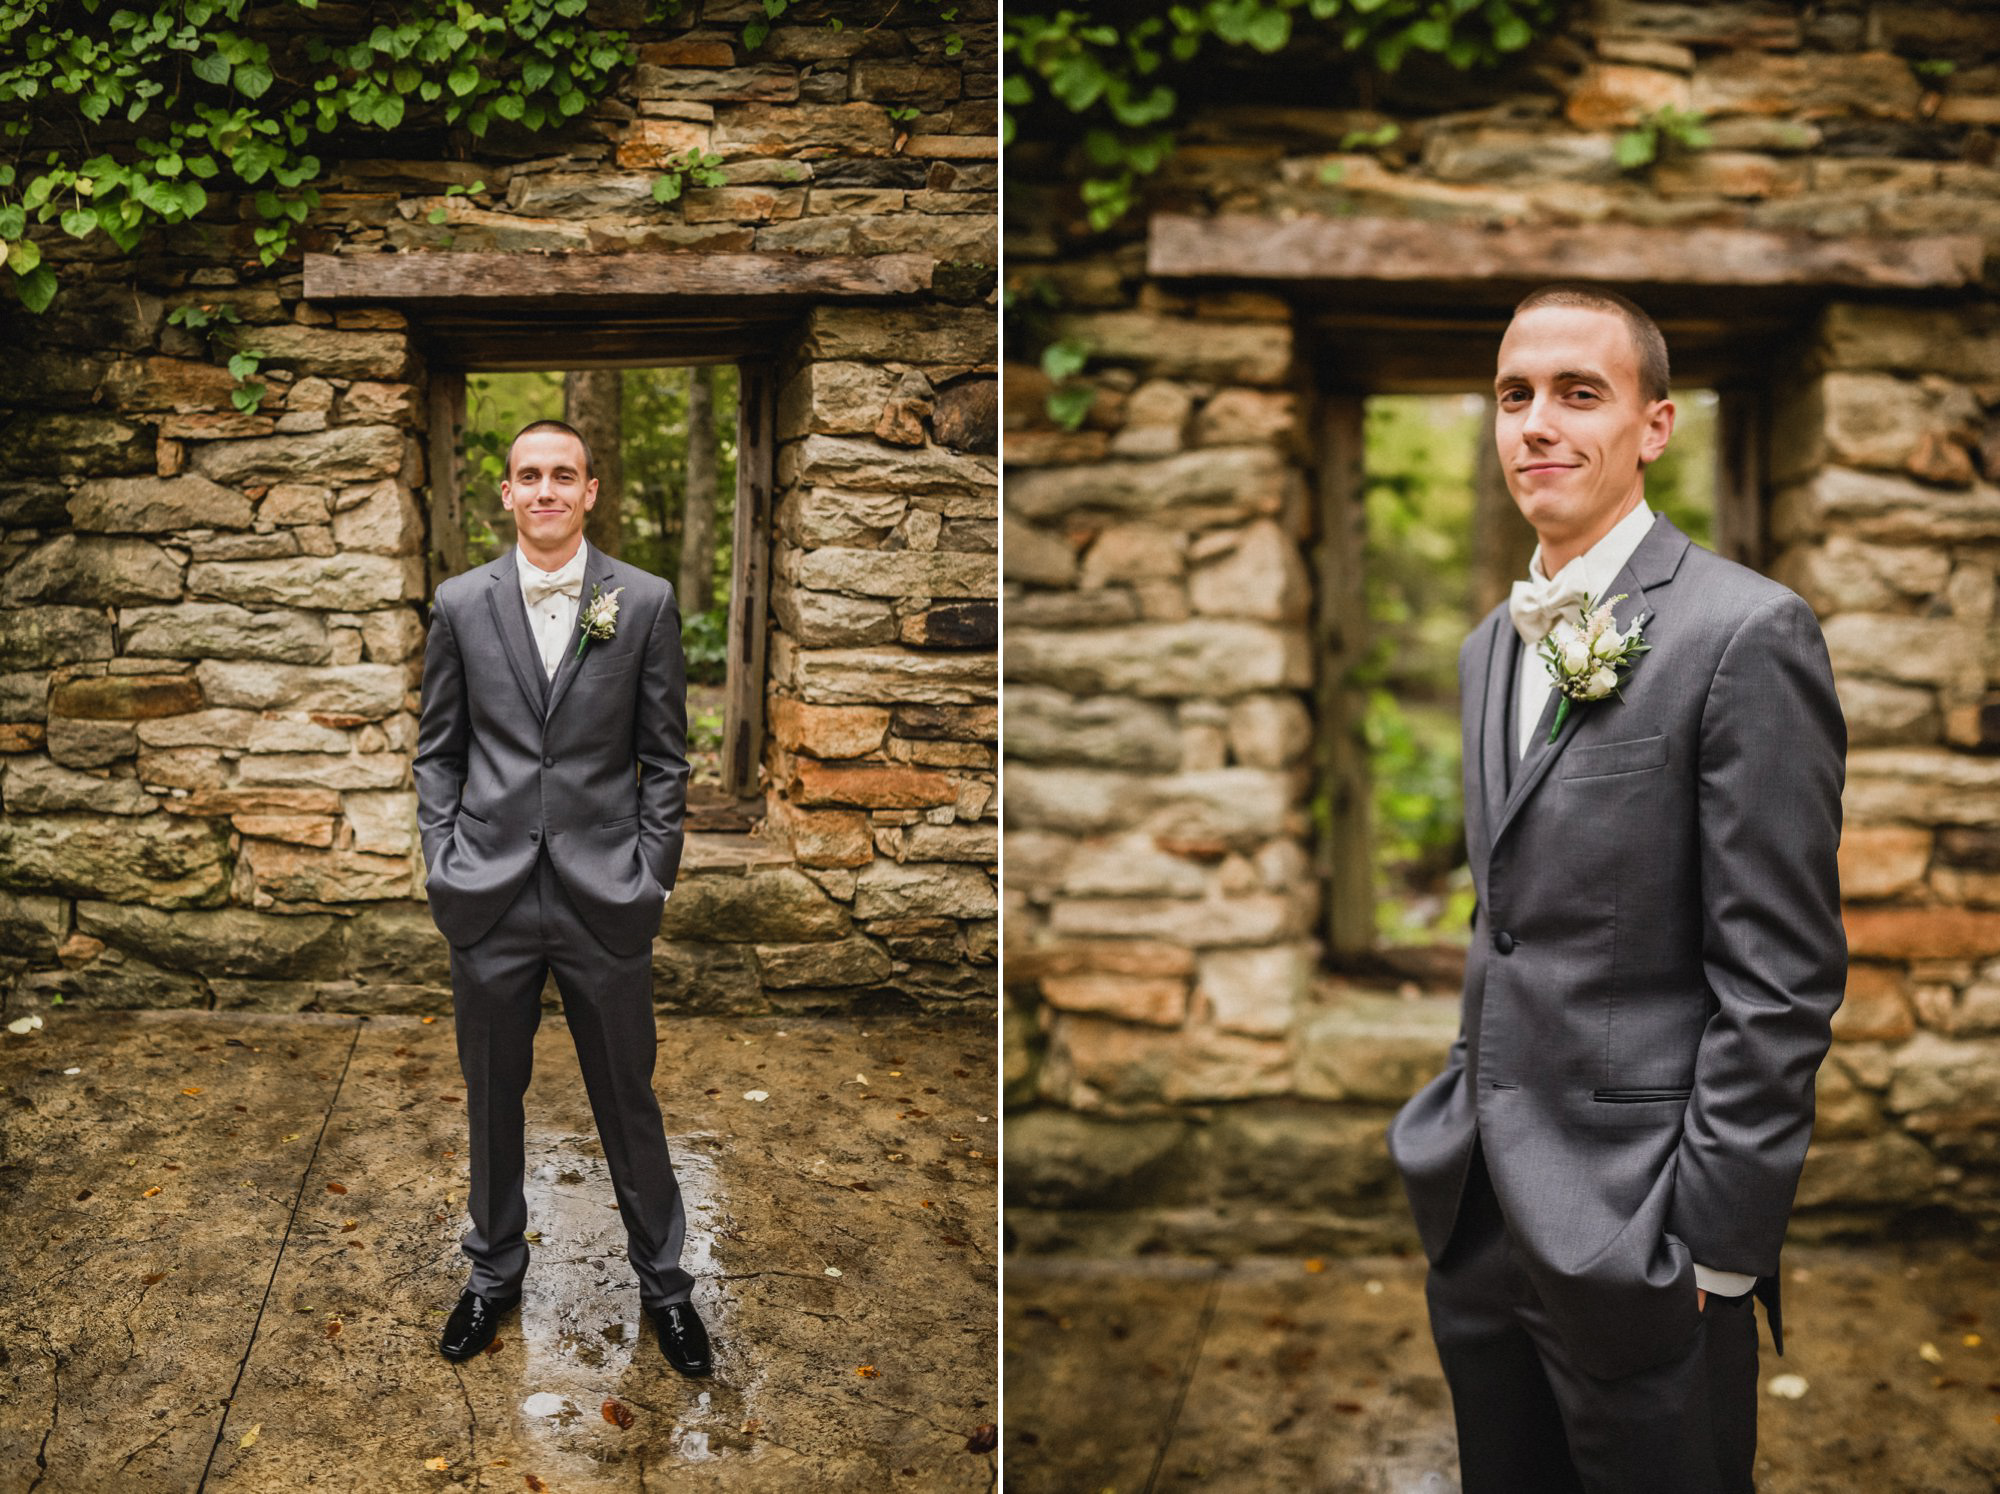 wedding-photography-virginia_0027.jpg